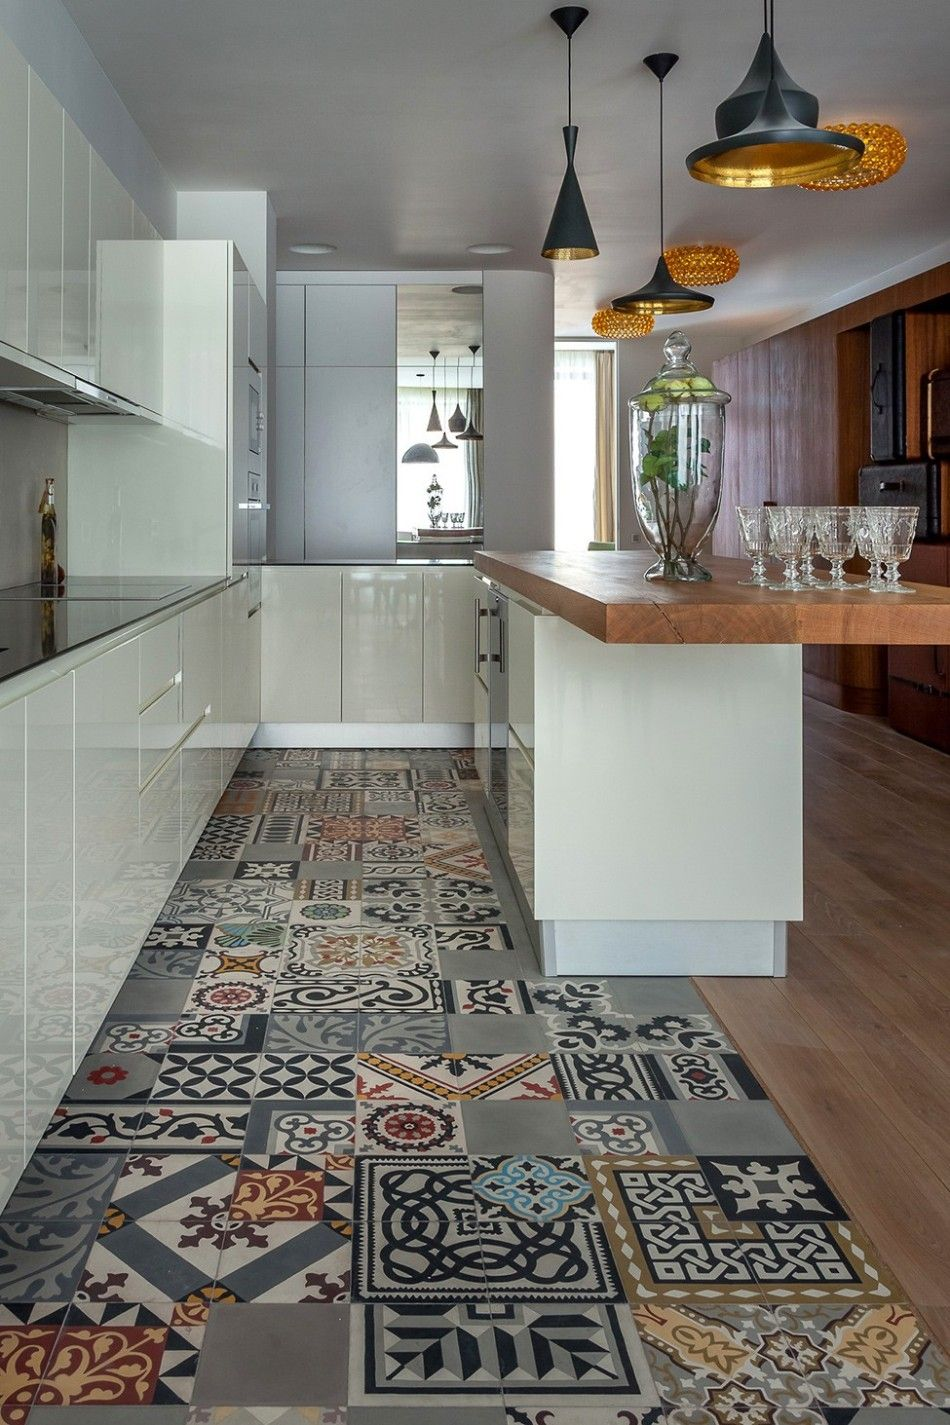 Funky Kitchen Floor Tile Design Decor Interior Home Ide